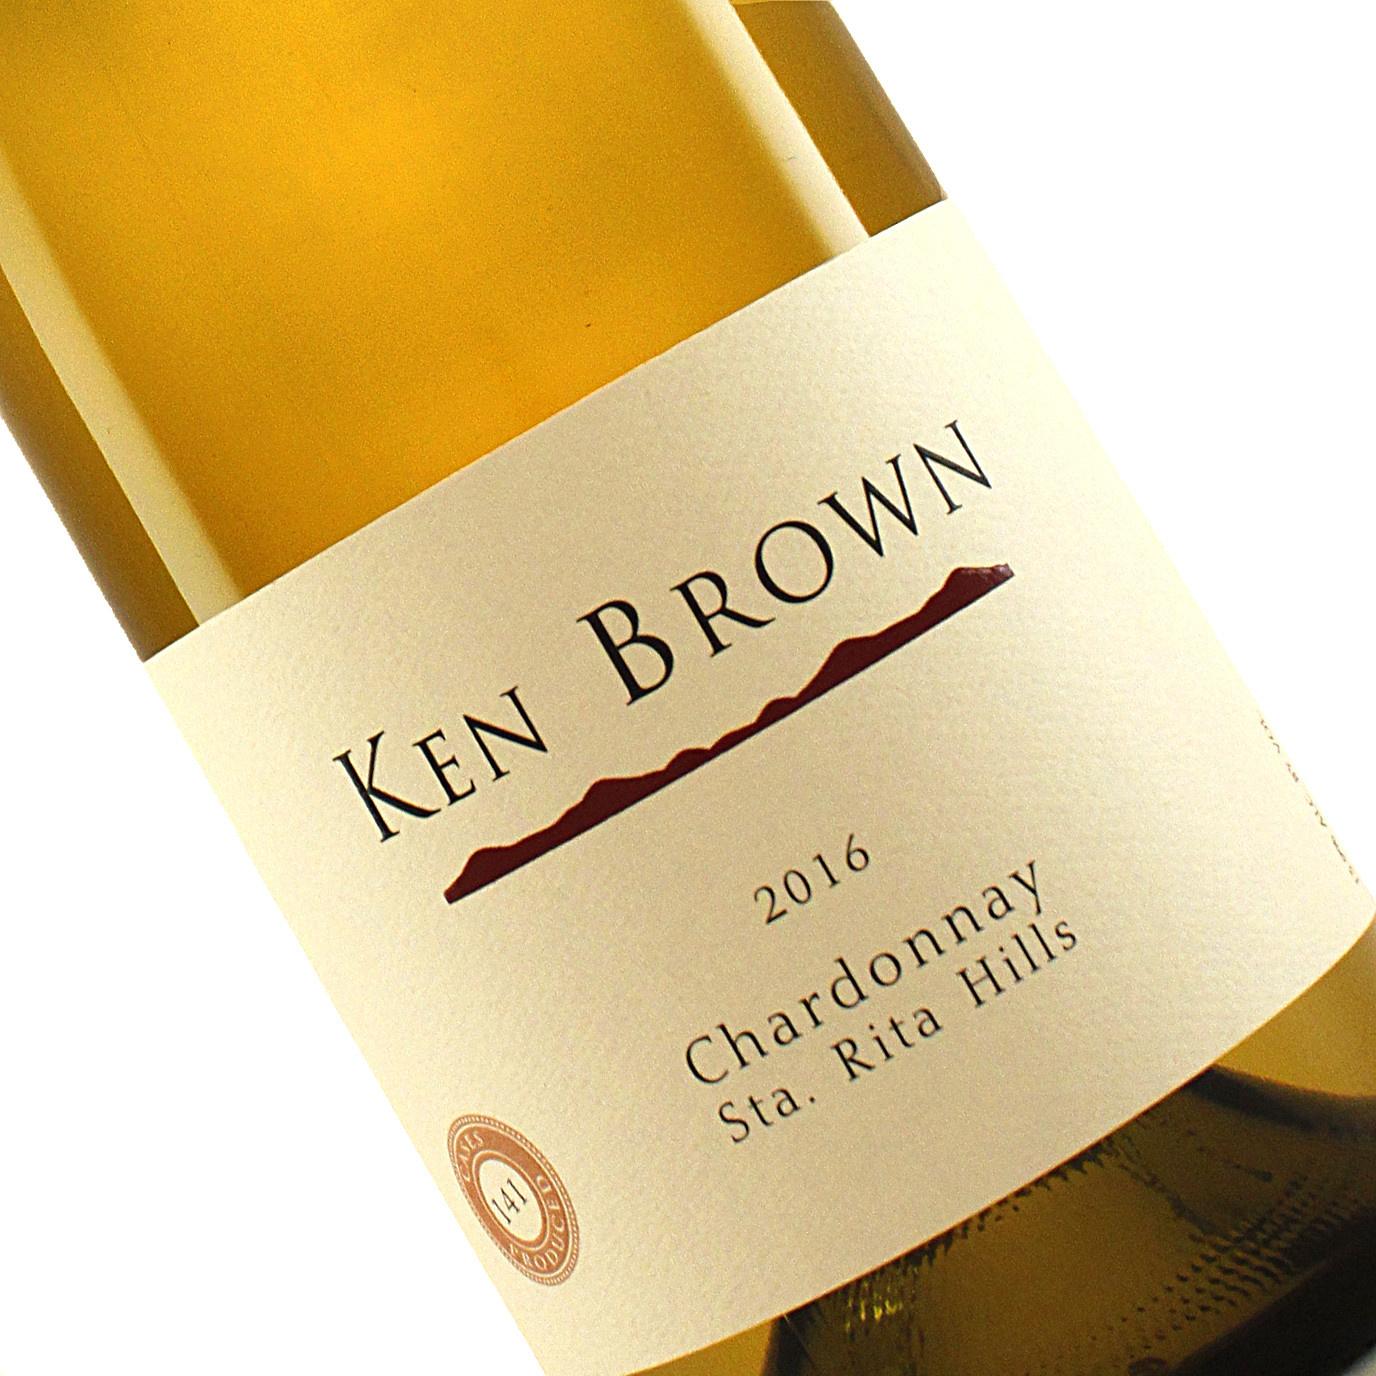 Ken Brown 2016 Chardonnay Sta. Rita Hills